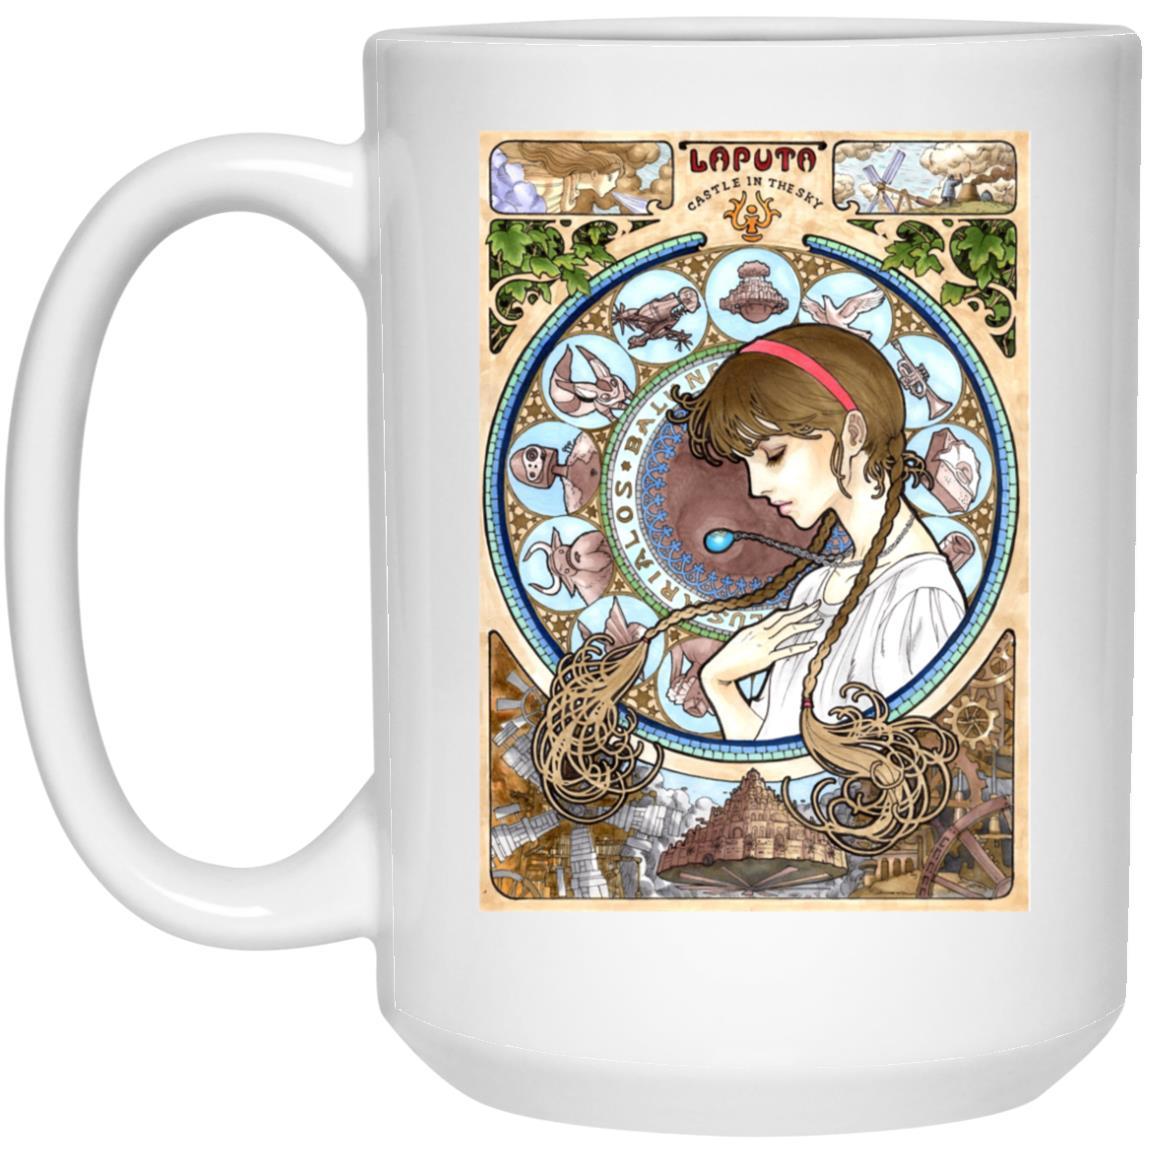 Laputa: Castle in The Sky – Sheeta Portrait Art Mug